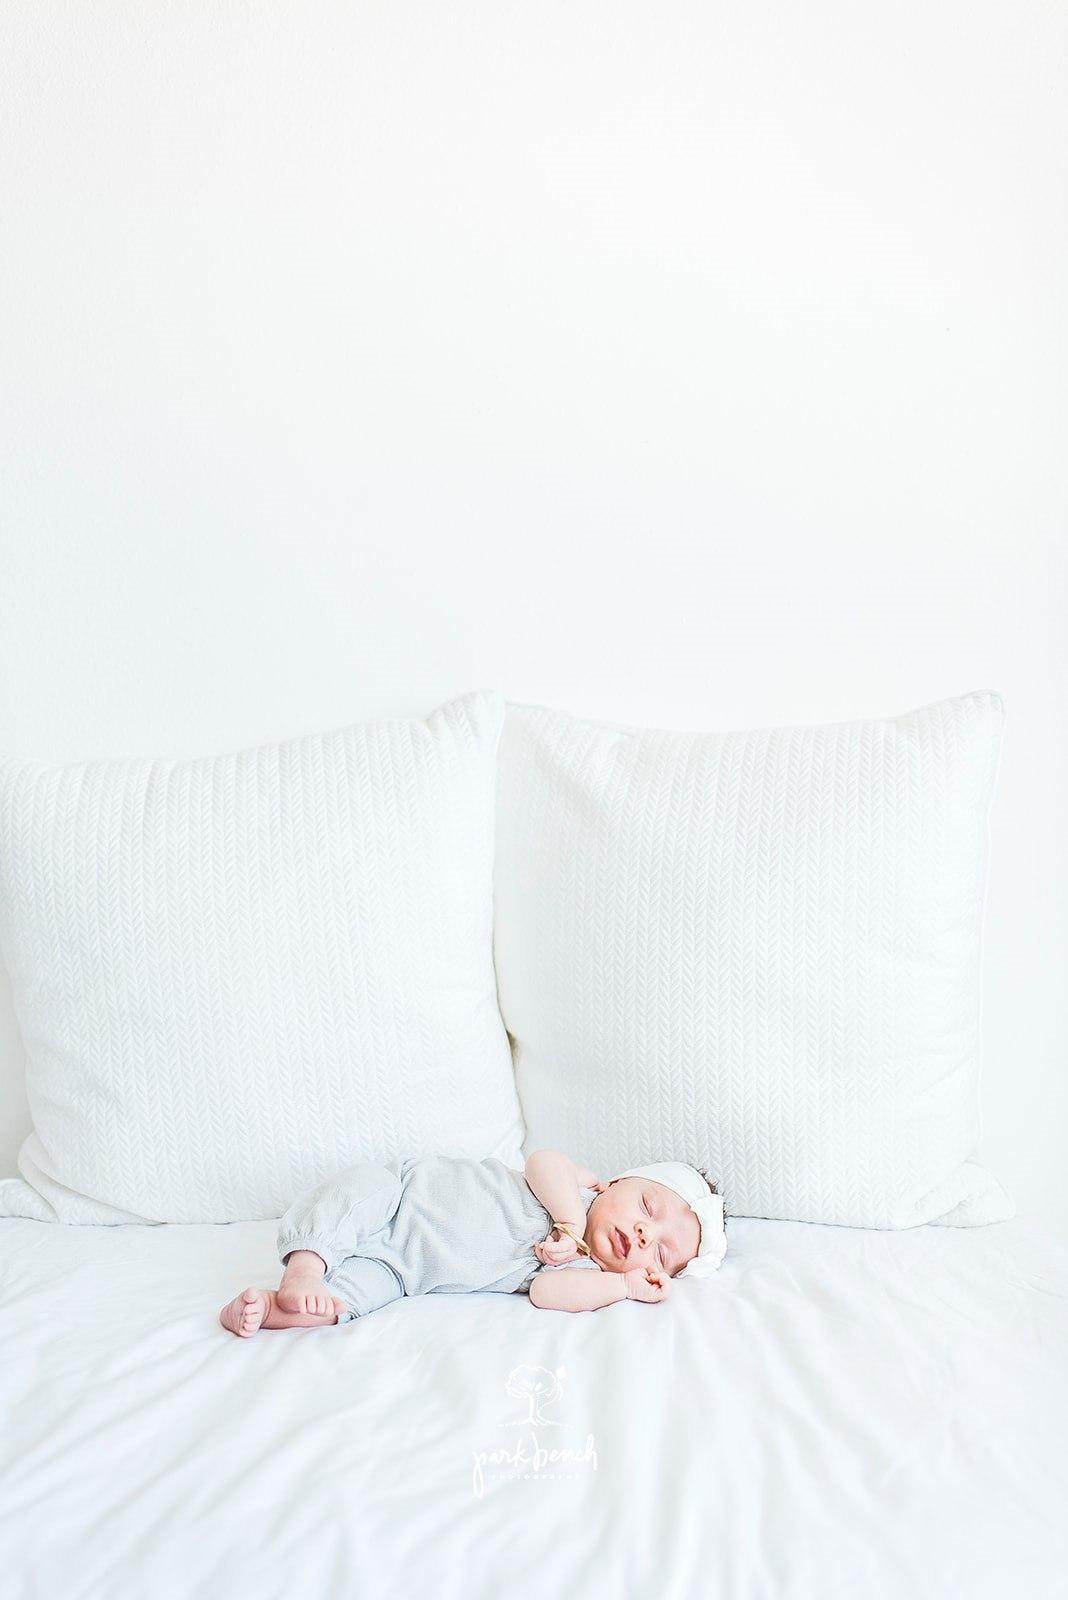 Park-Bench-Photography-Dallas-Newborn-Photographer-12.jpg